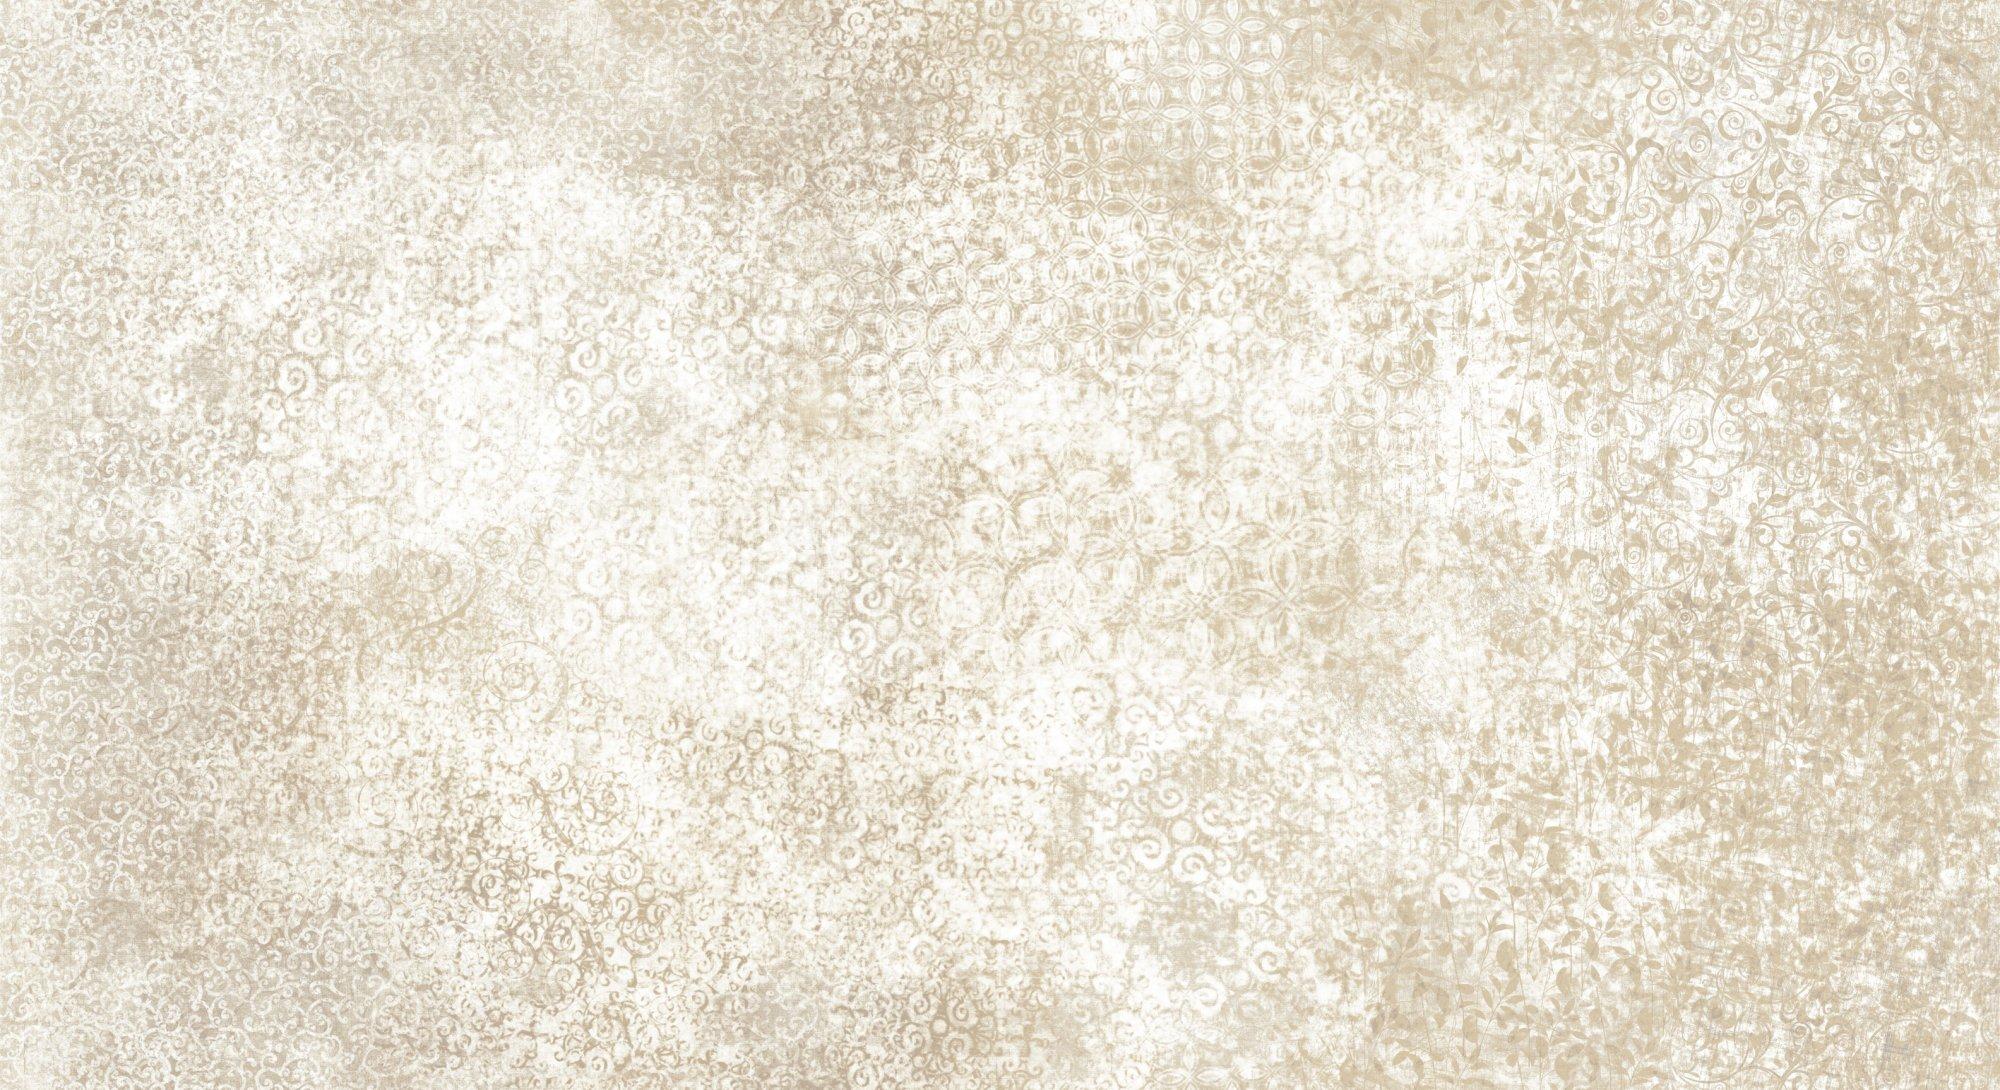 Scrollscapes 1649-24362-KE Stone